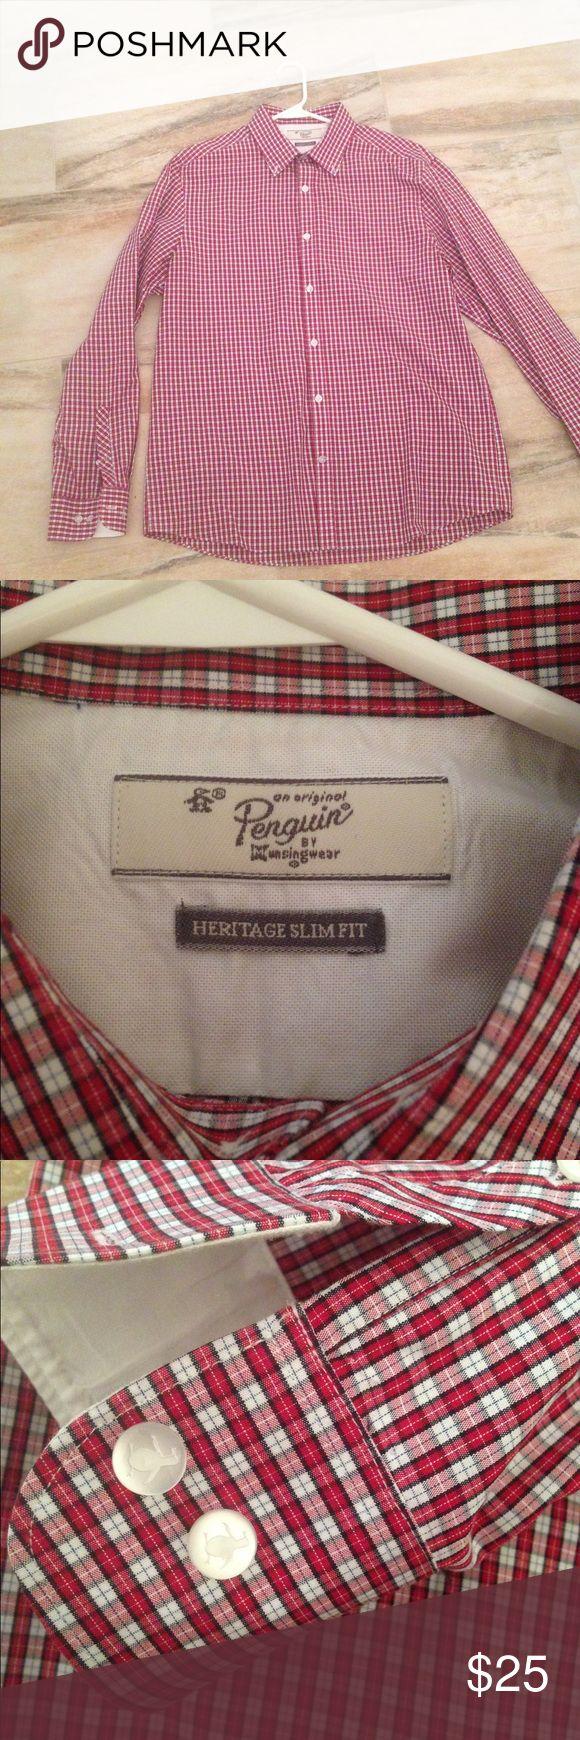 Men's penguin heritage slim fit dress shirt Brand new men's long sleeve red, white, and blue checkered dress shirt Original Penguin Shirts Dress Shirts